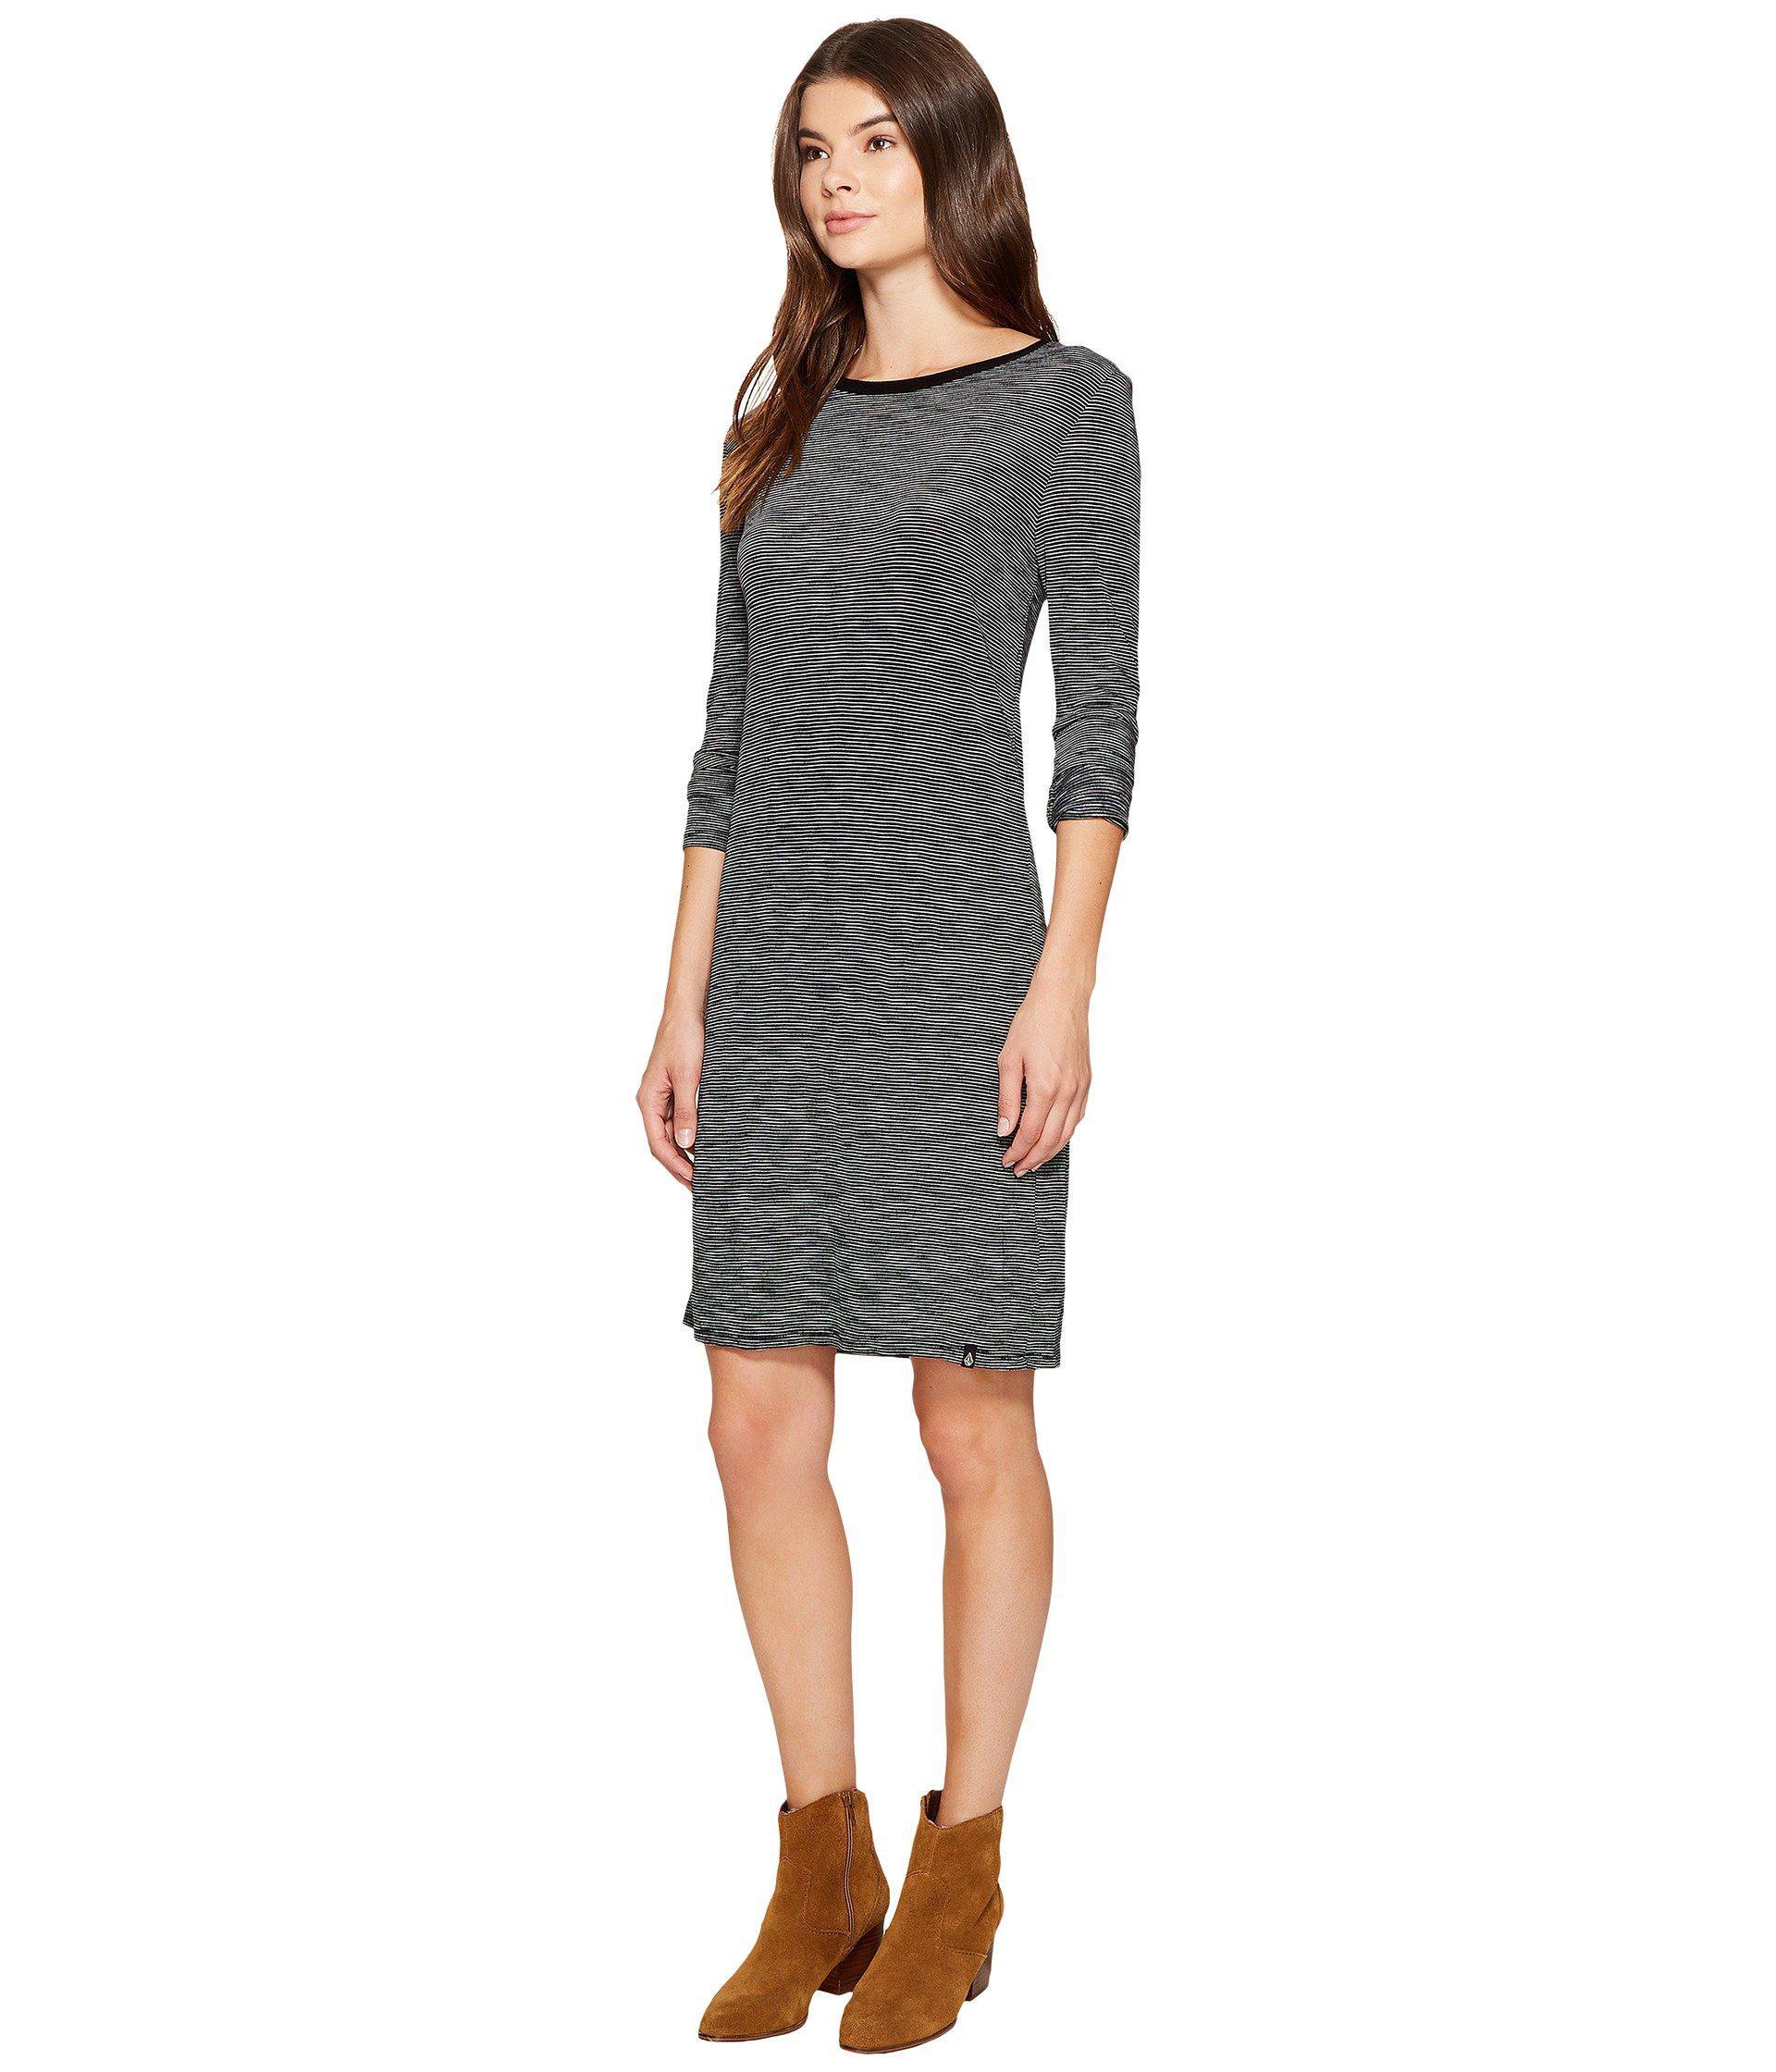 bf08fd2c9c Lyst - Volcom Lil Long Sleeve Dress in Black - Save 4%